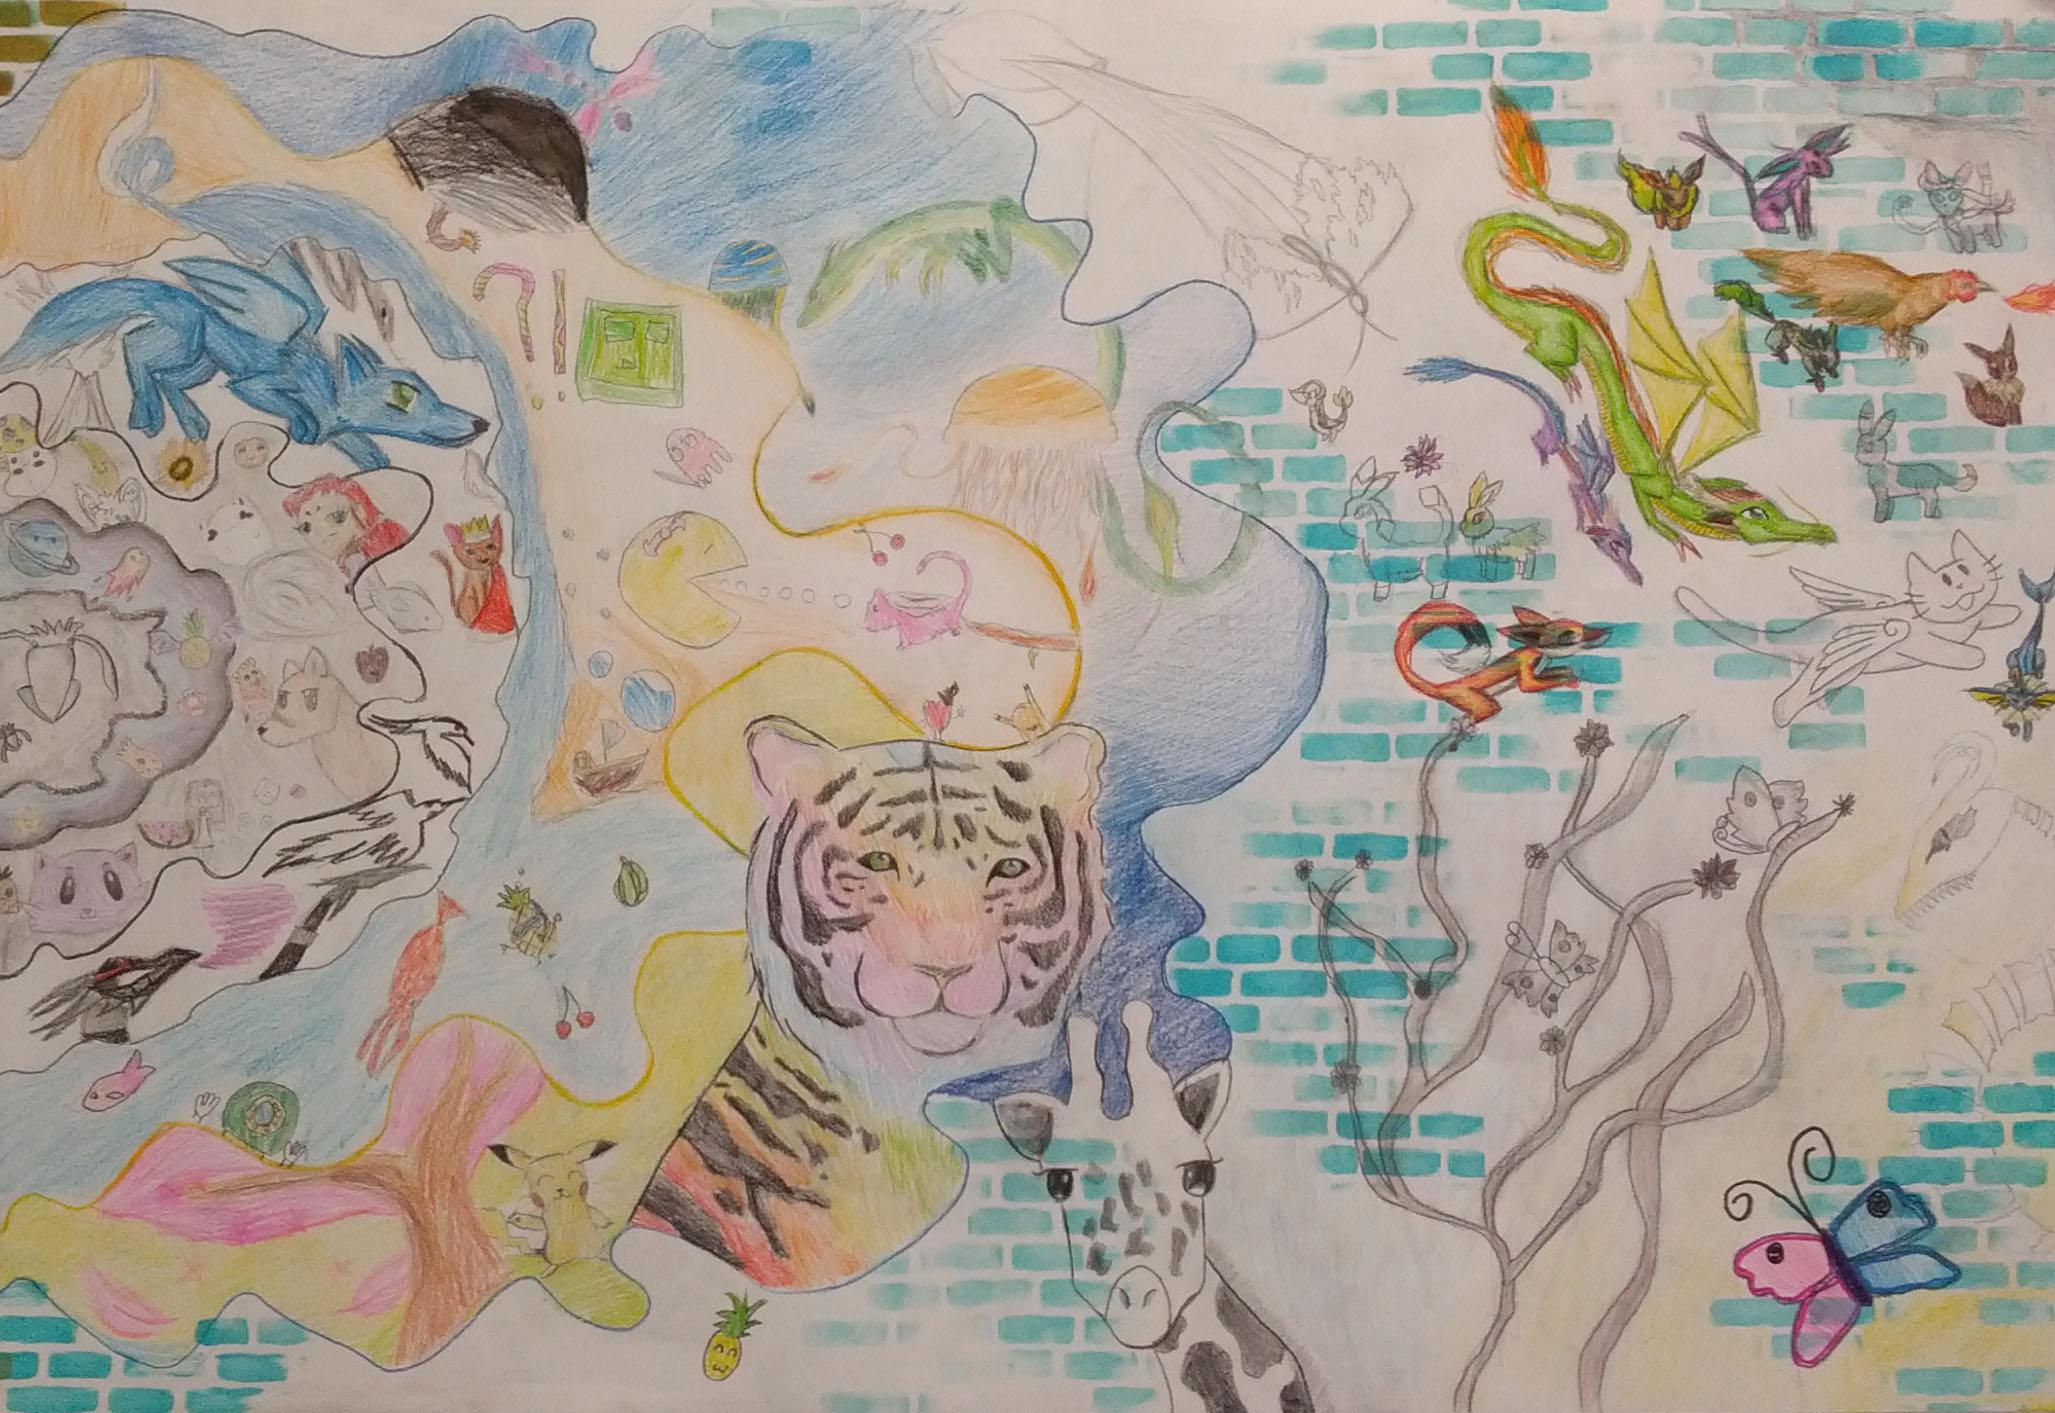 Imagination portal 2